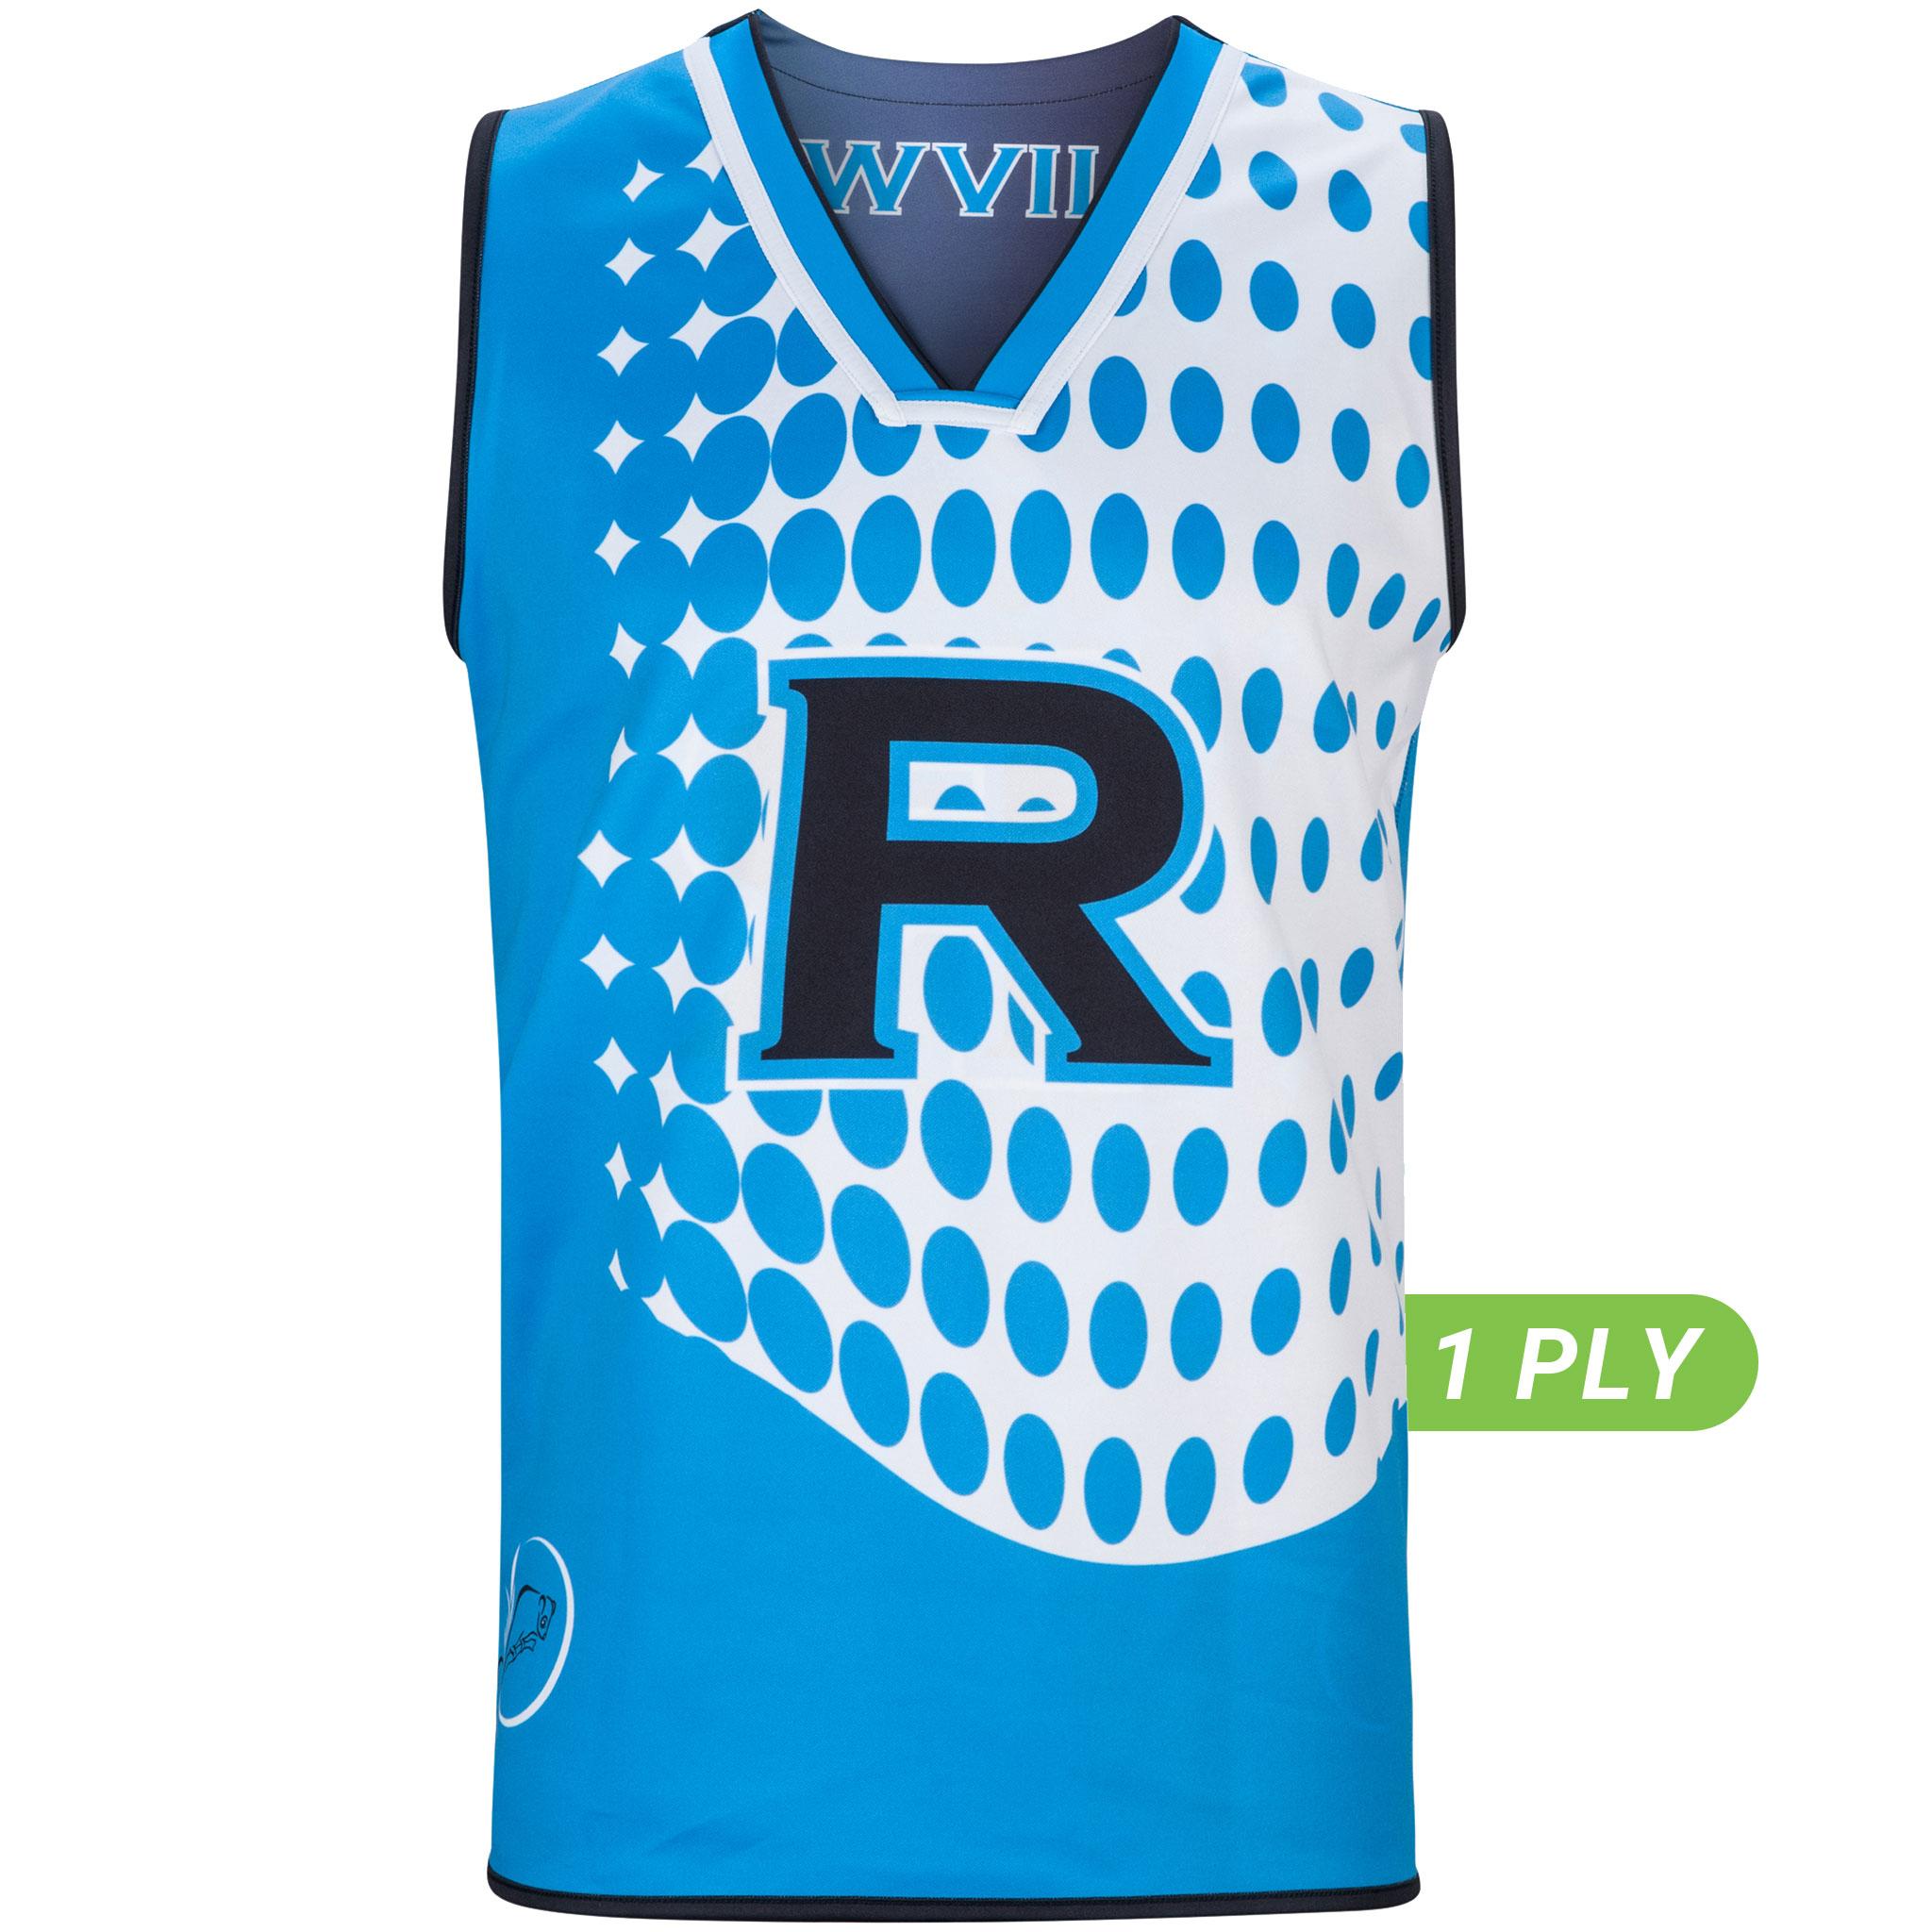 1 PLY Reversible Basketball Singlet